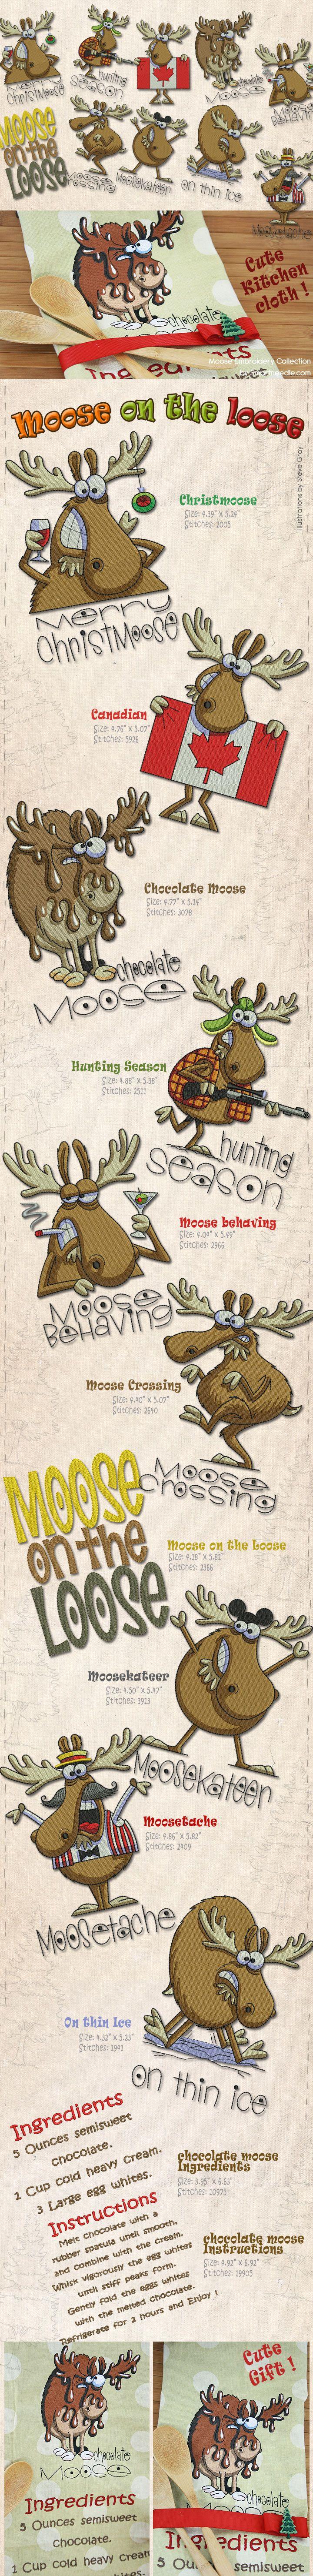 best 10 funny moose ideas on pinterest somber definition moose